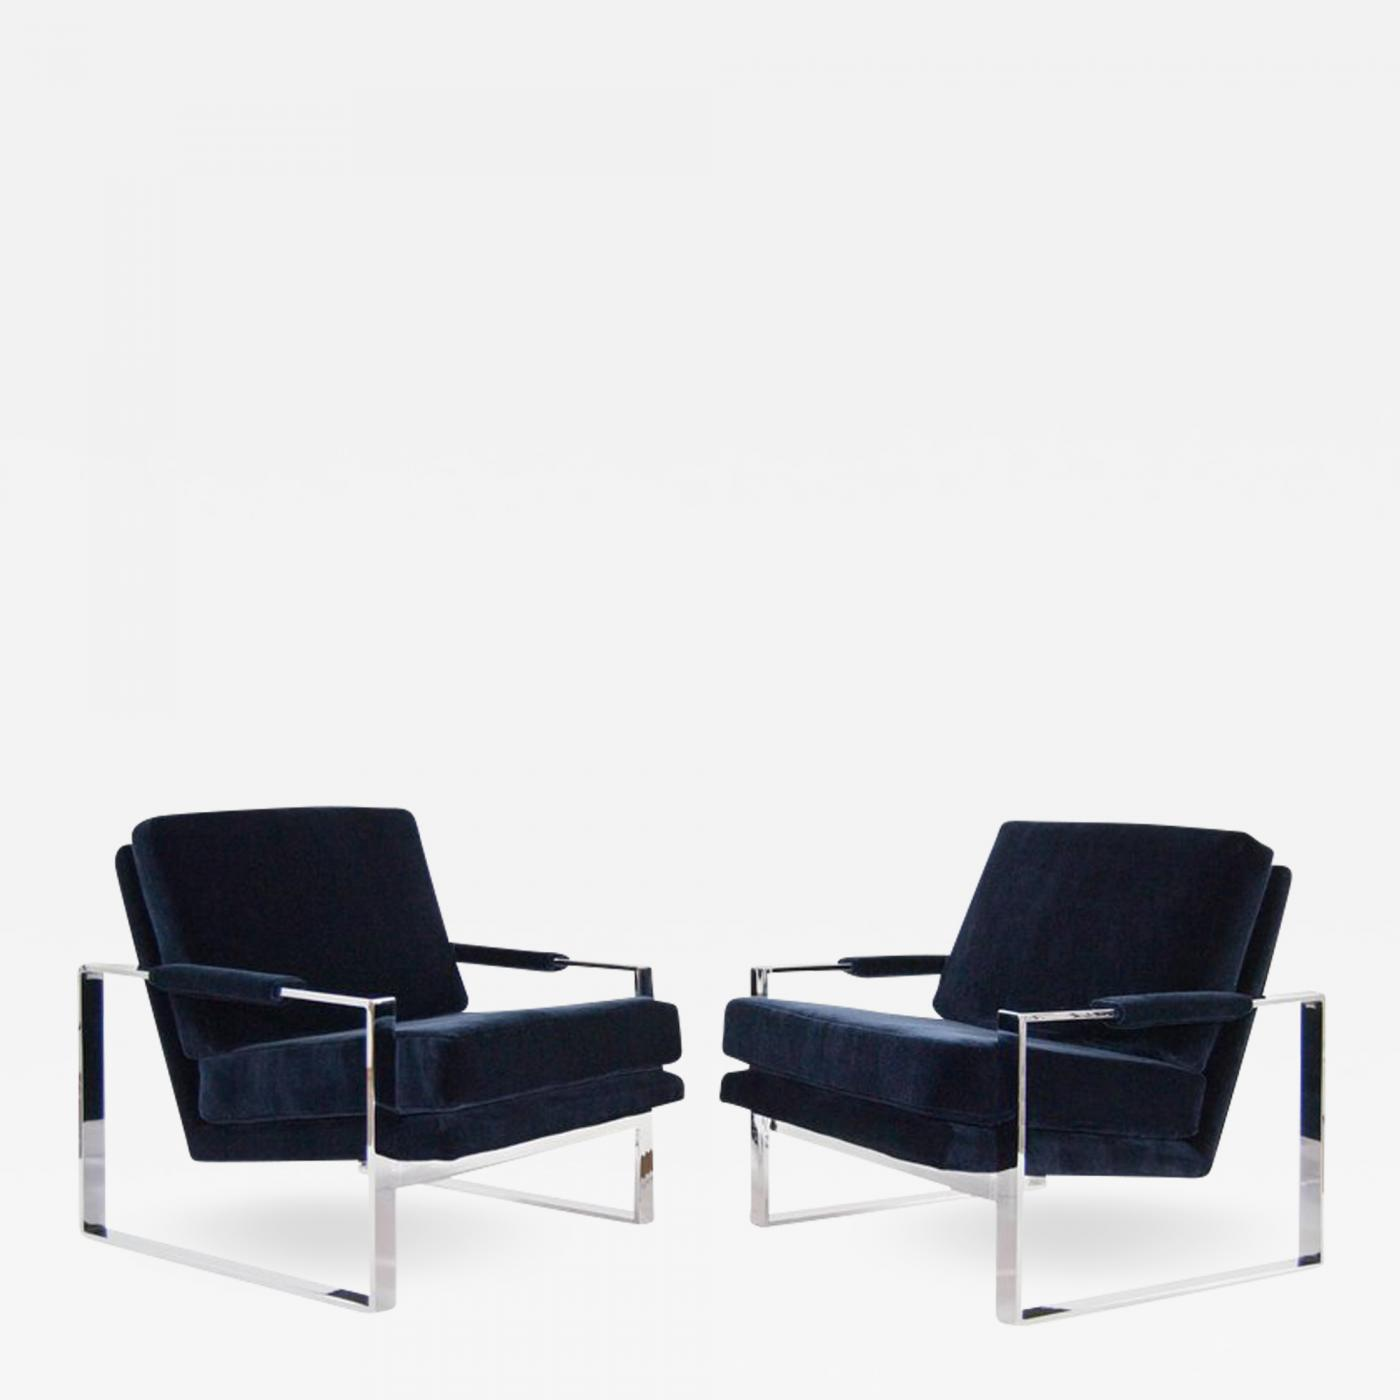 Attirant Listings / Furniture / Seating / Armchairs